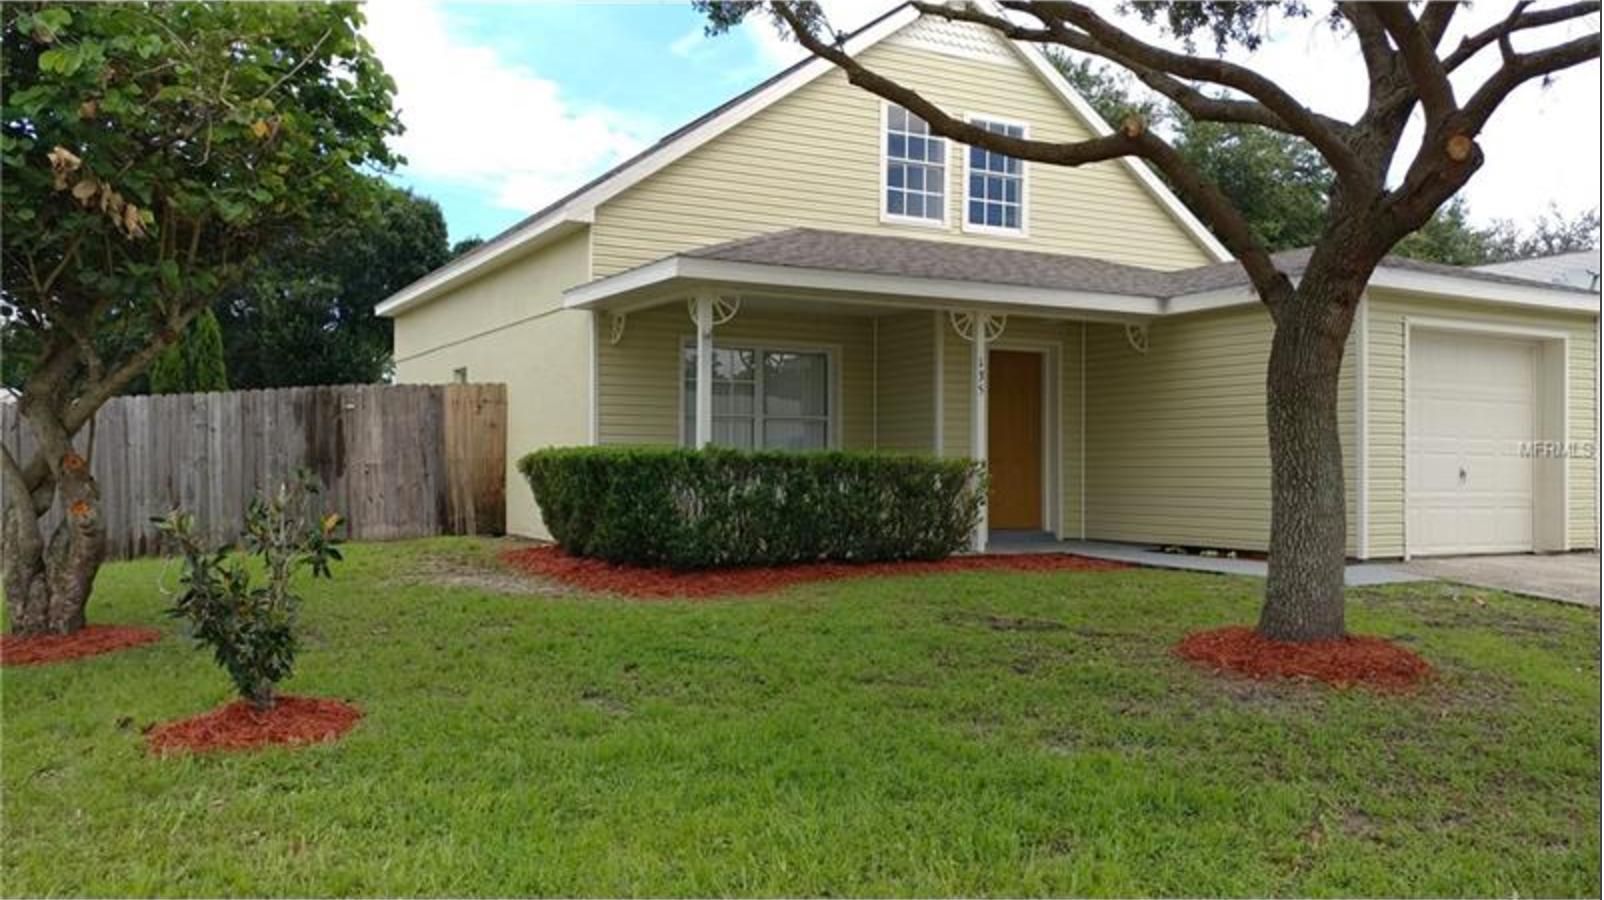 135 Hartsdale Dr For Rent - Winter Garden, FL | Trulia